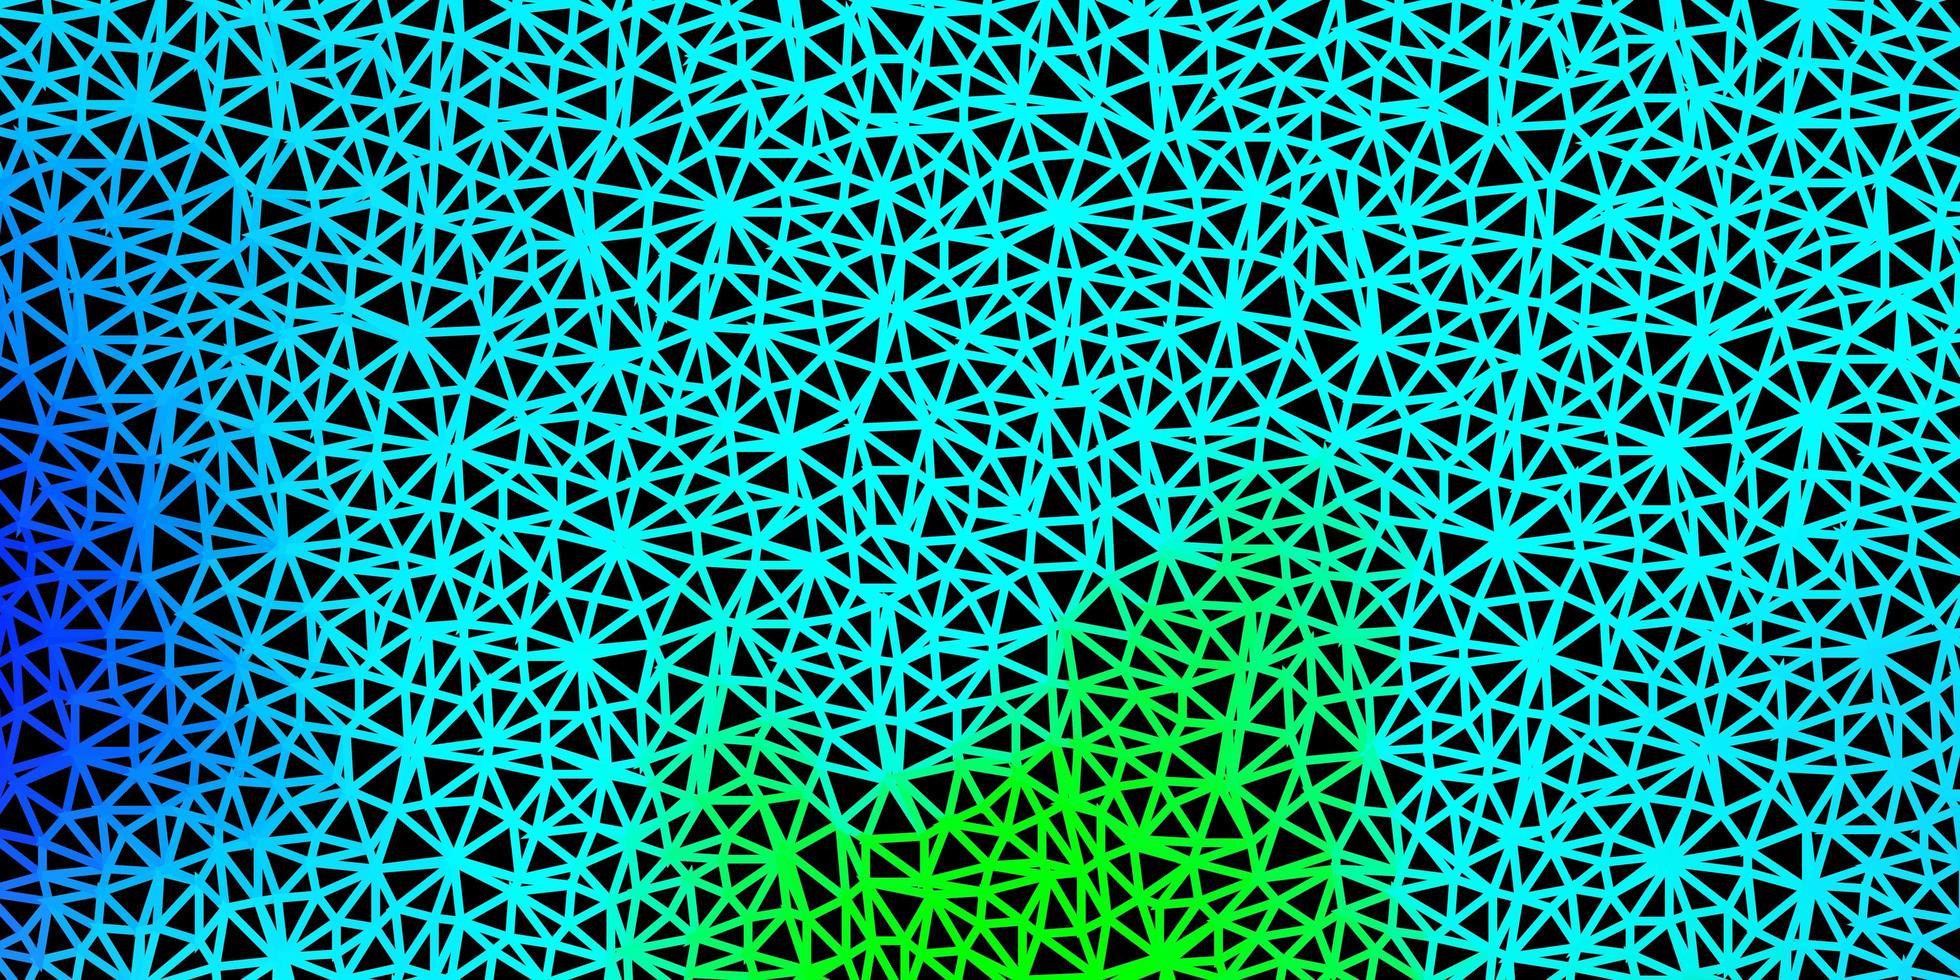 ljus flerfärgad vektor gradient polygon tapet.